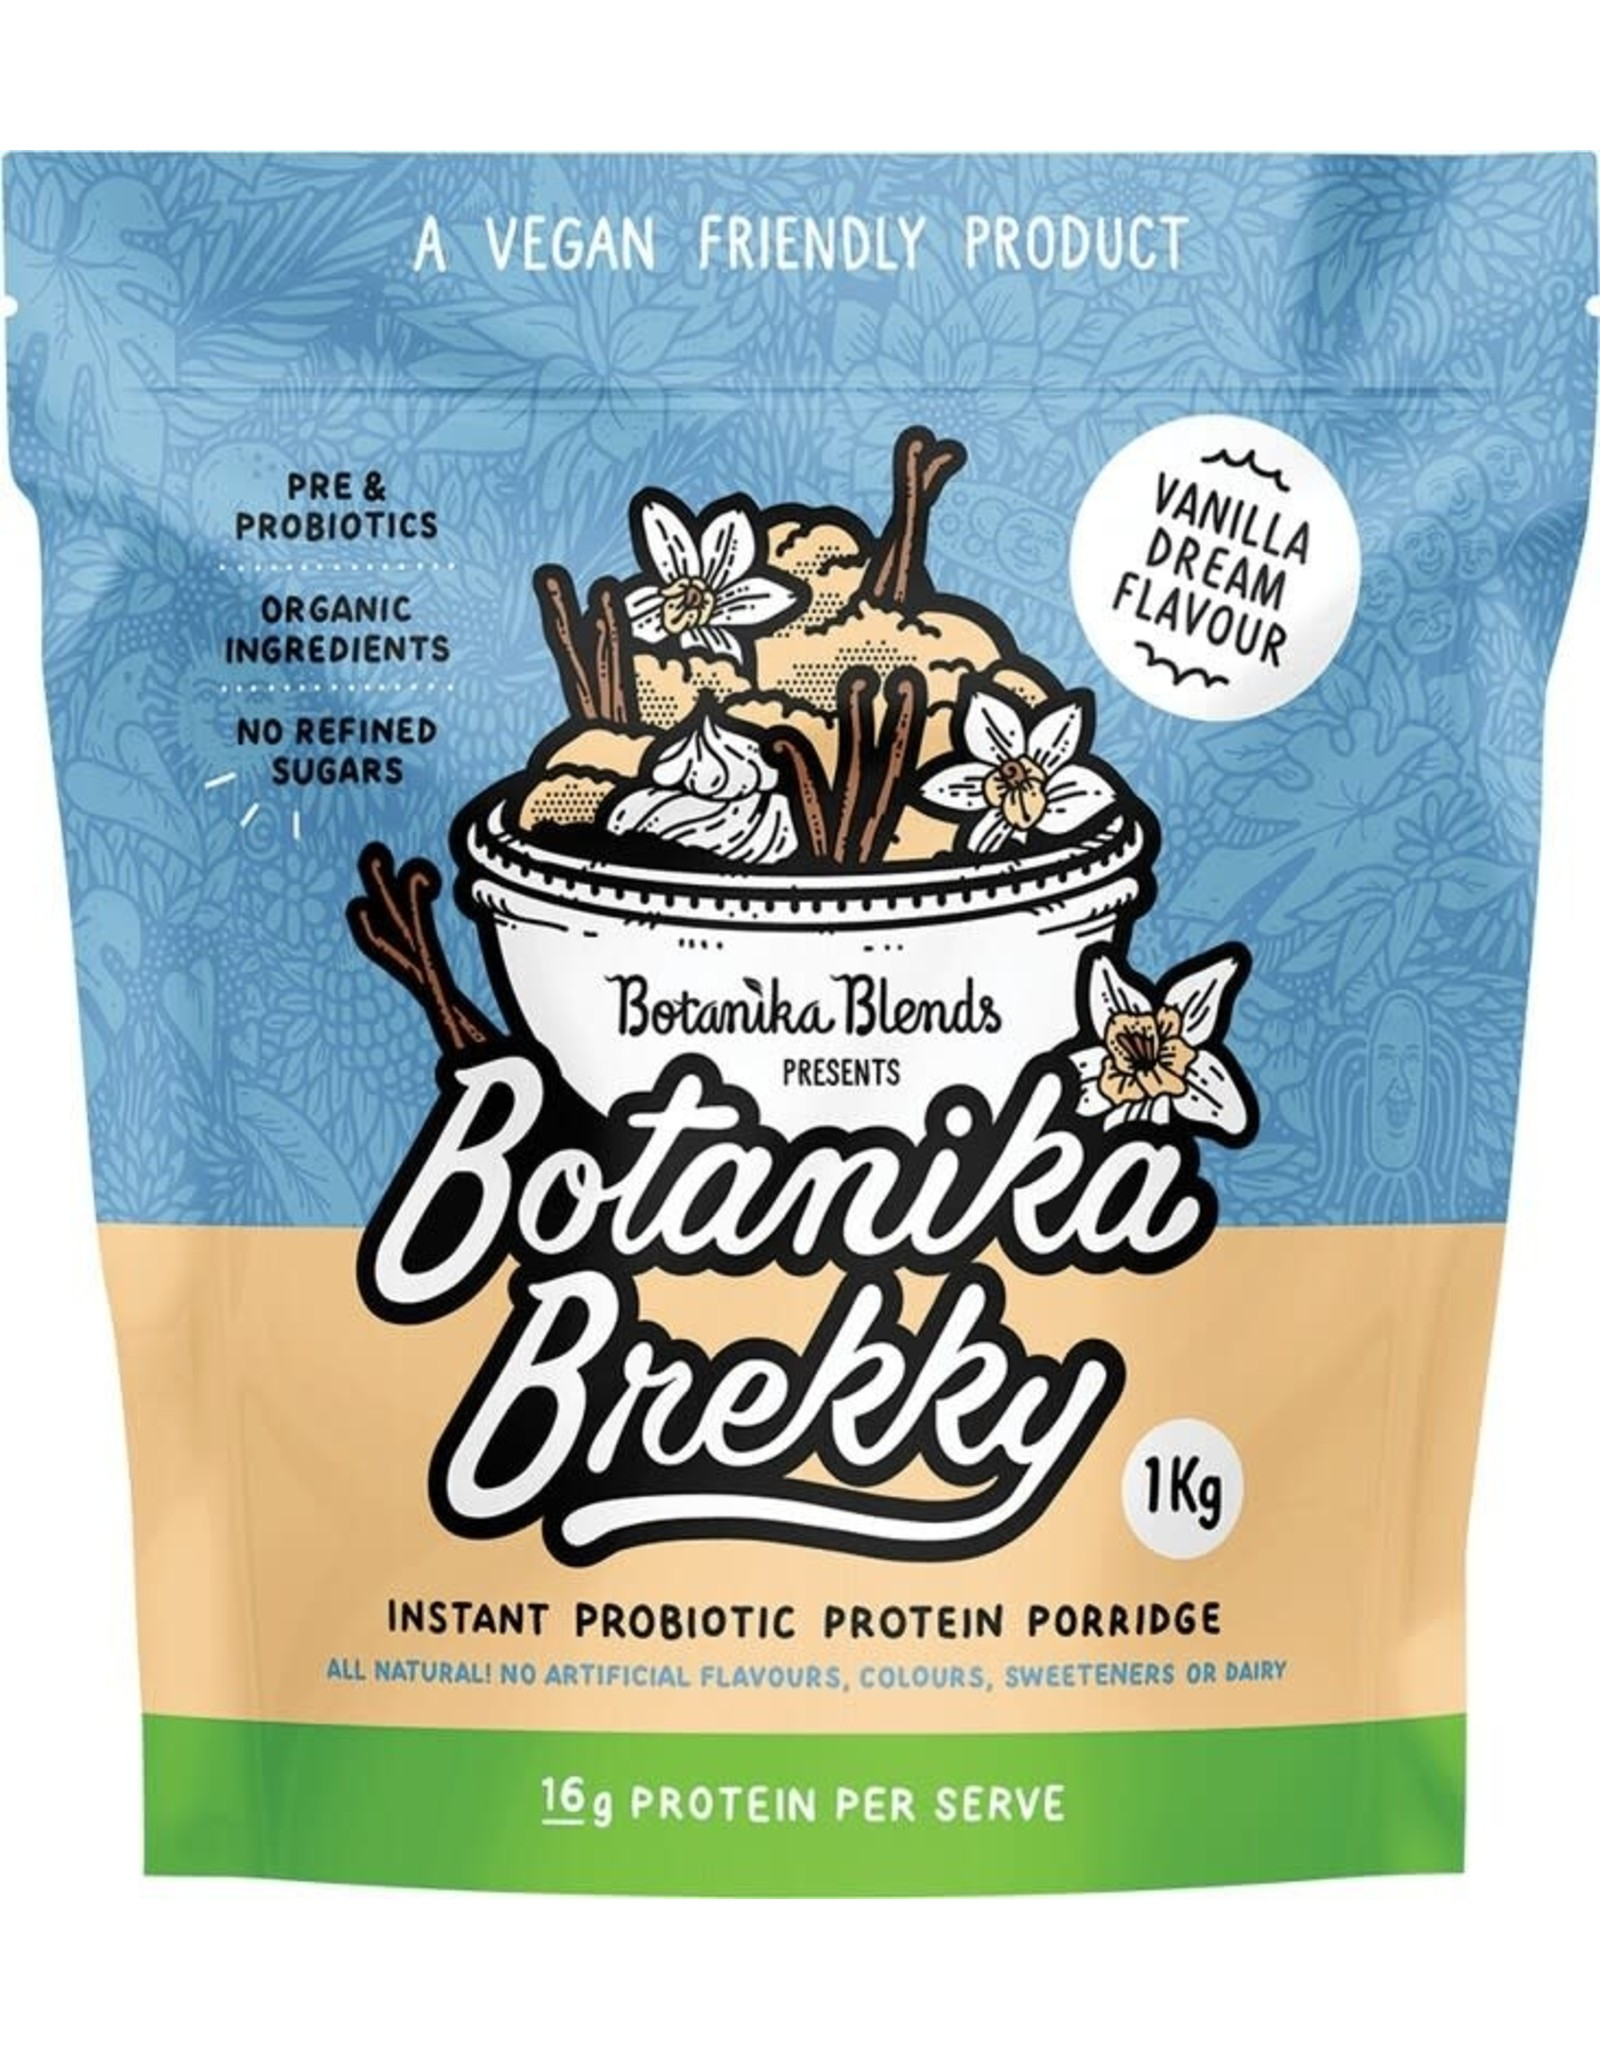 Botanika Brekky Probiotic Porridge - Vanilla Dream - 1kg